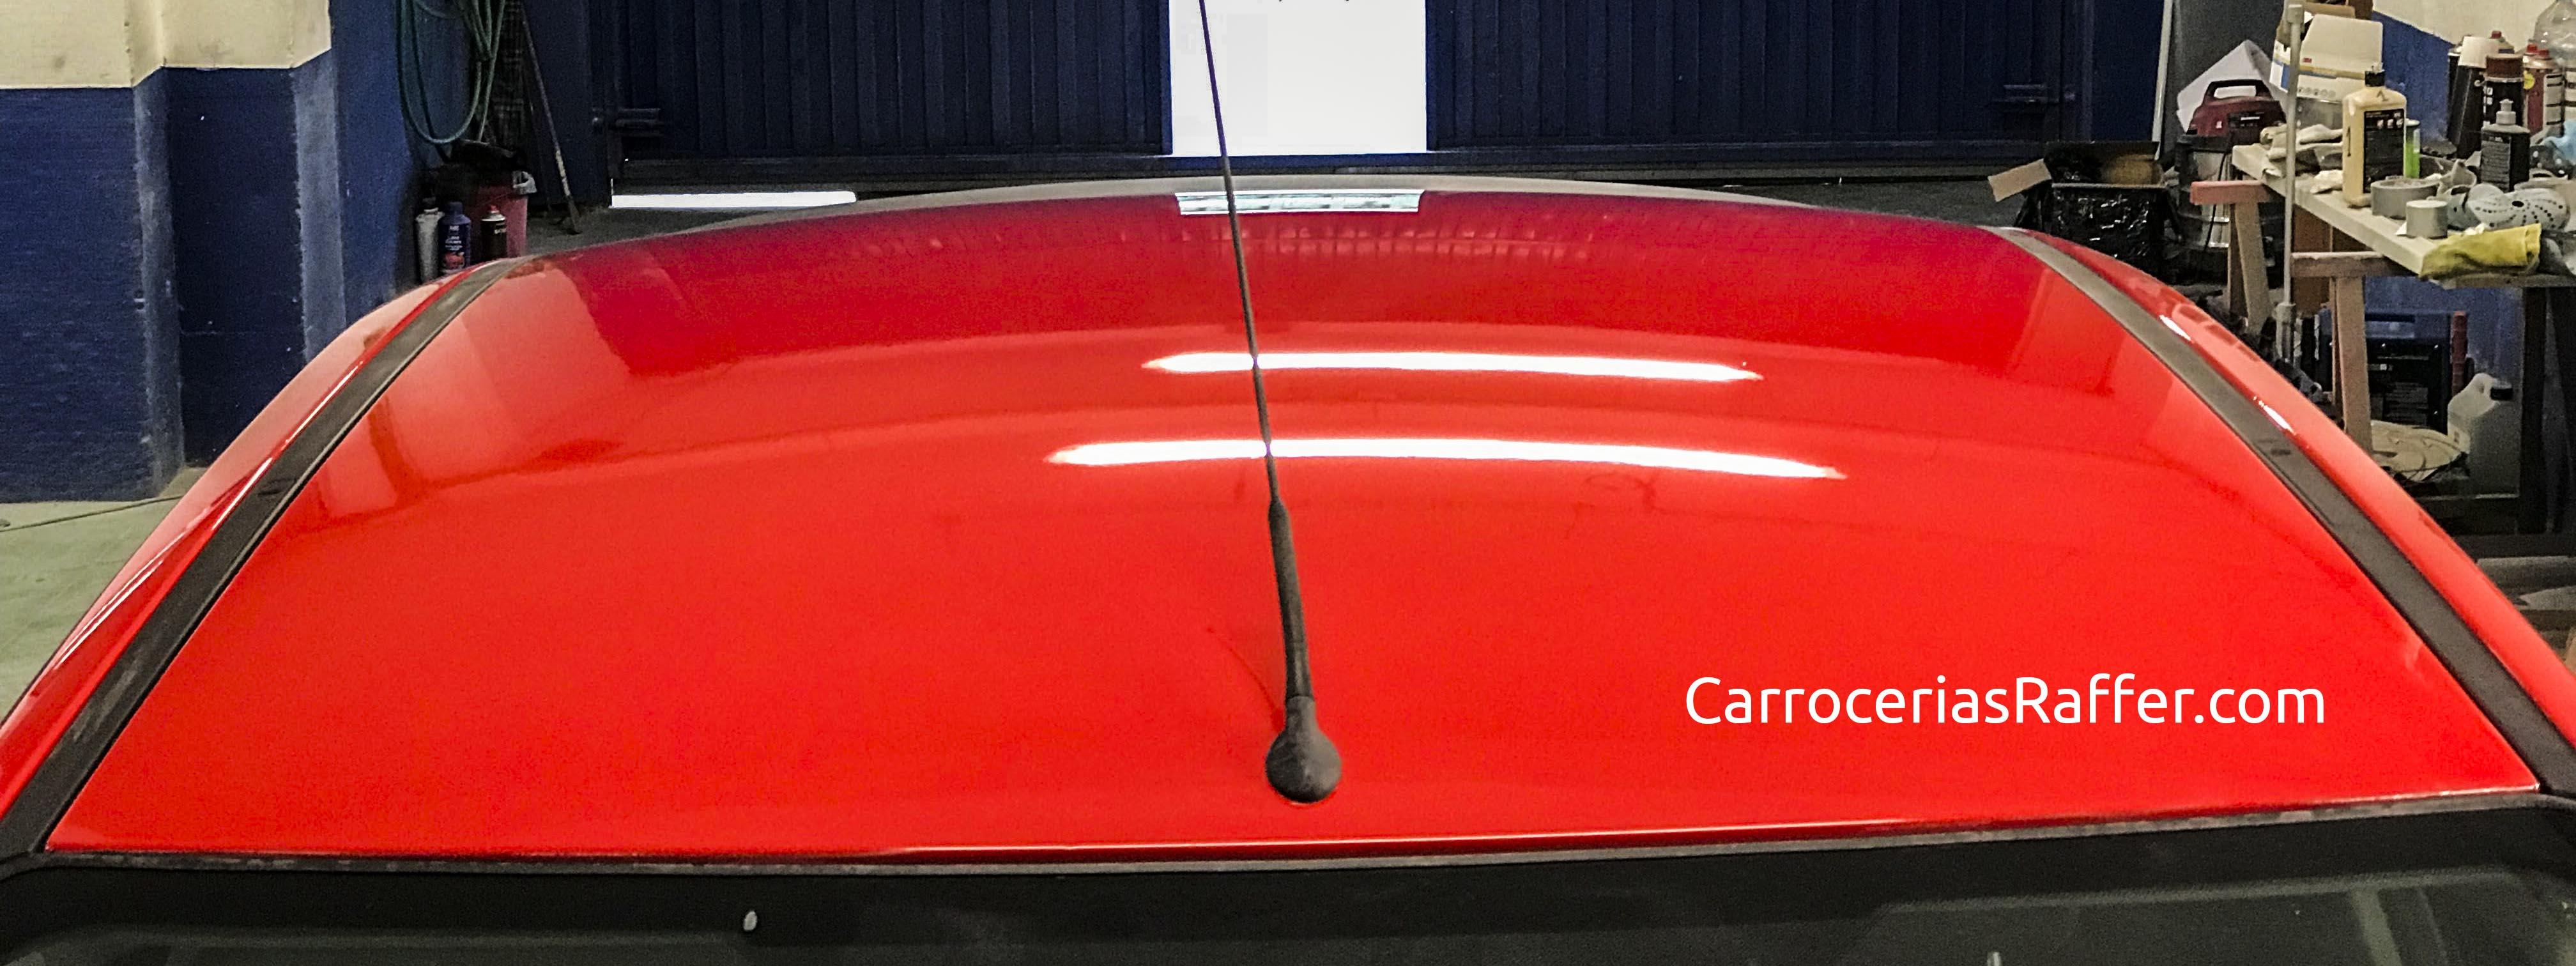 ford focus rojo pintado entero carrocerias raffer hernani